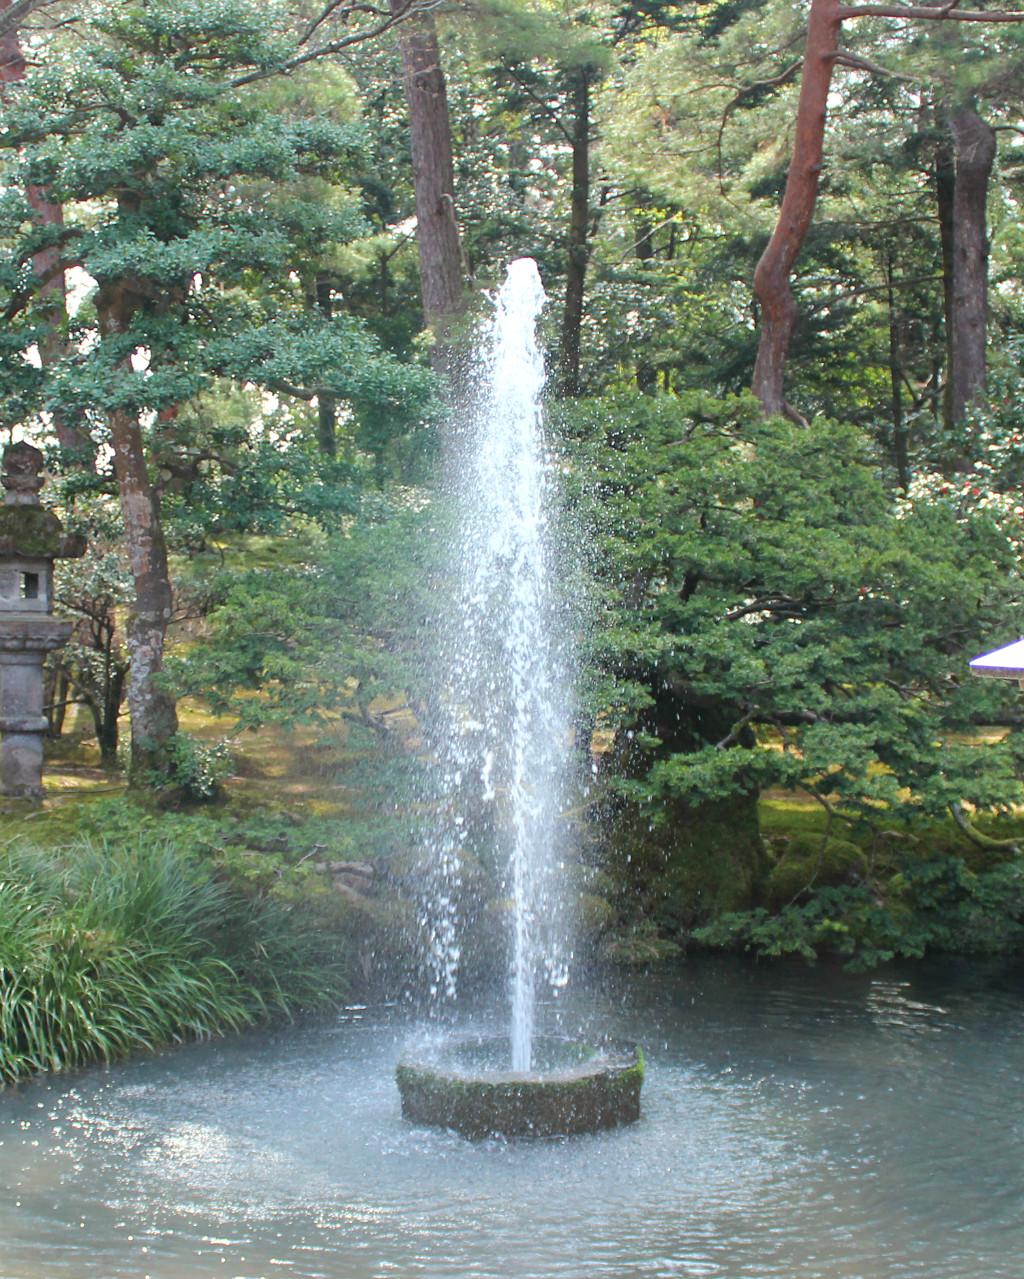 The Natural Pressure Fountain at Kenrokuen Garden Park in Kanazawa